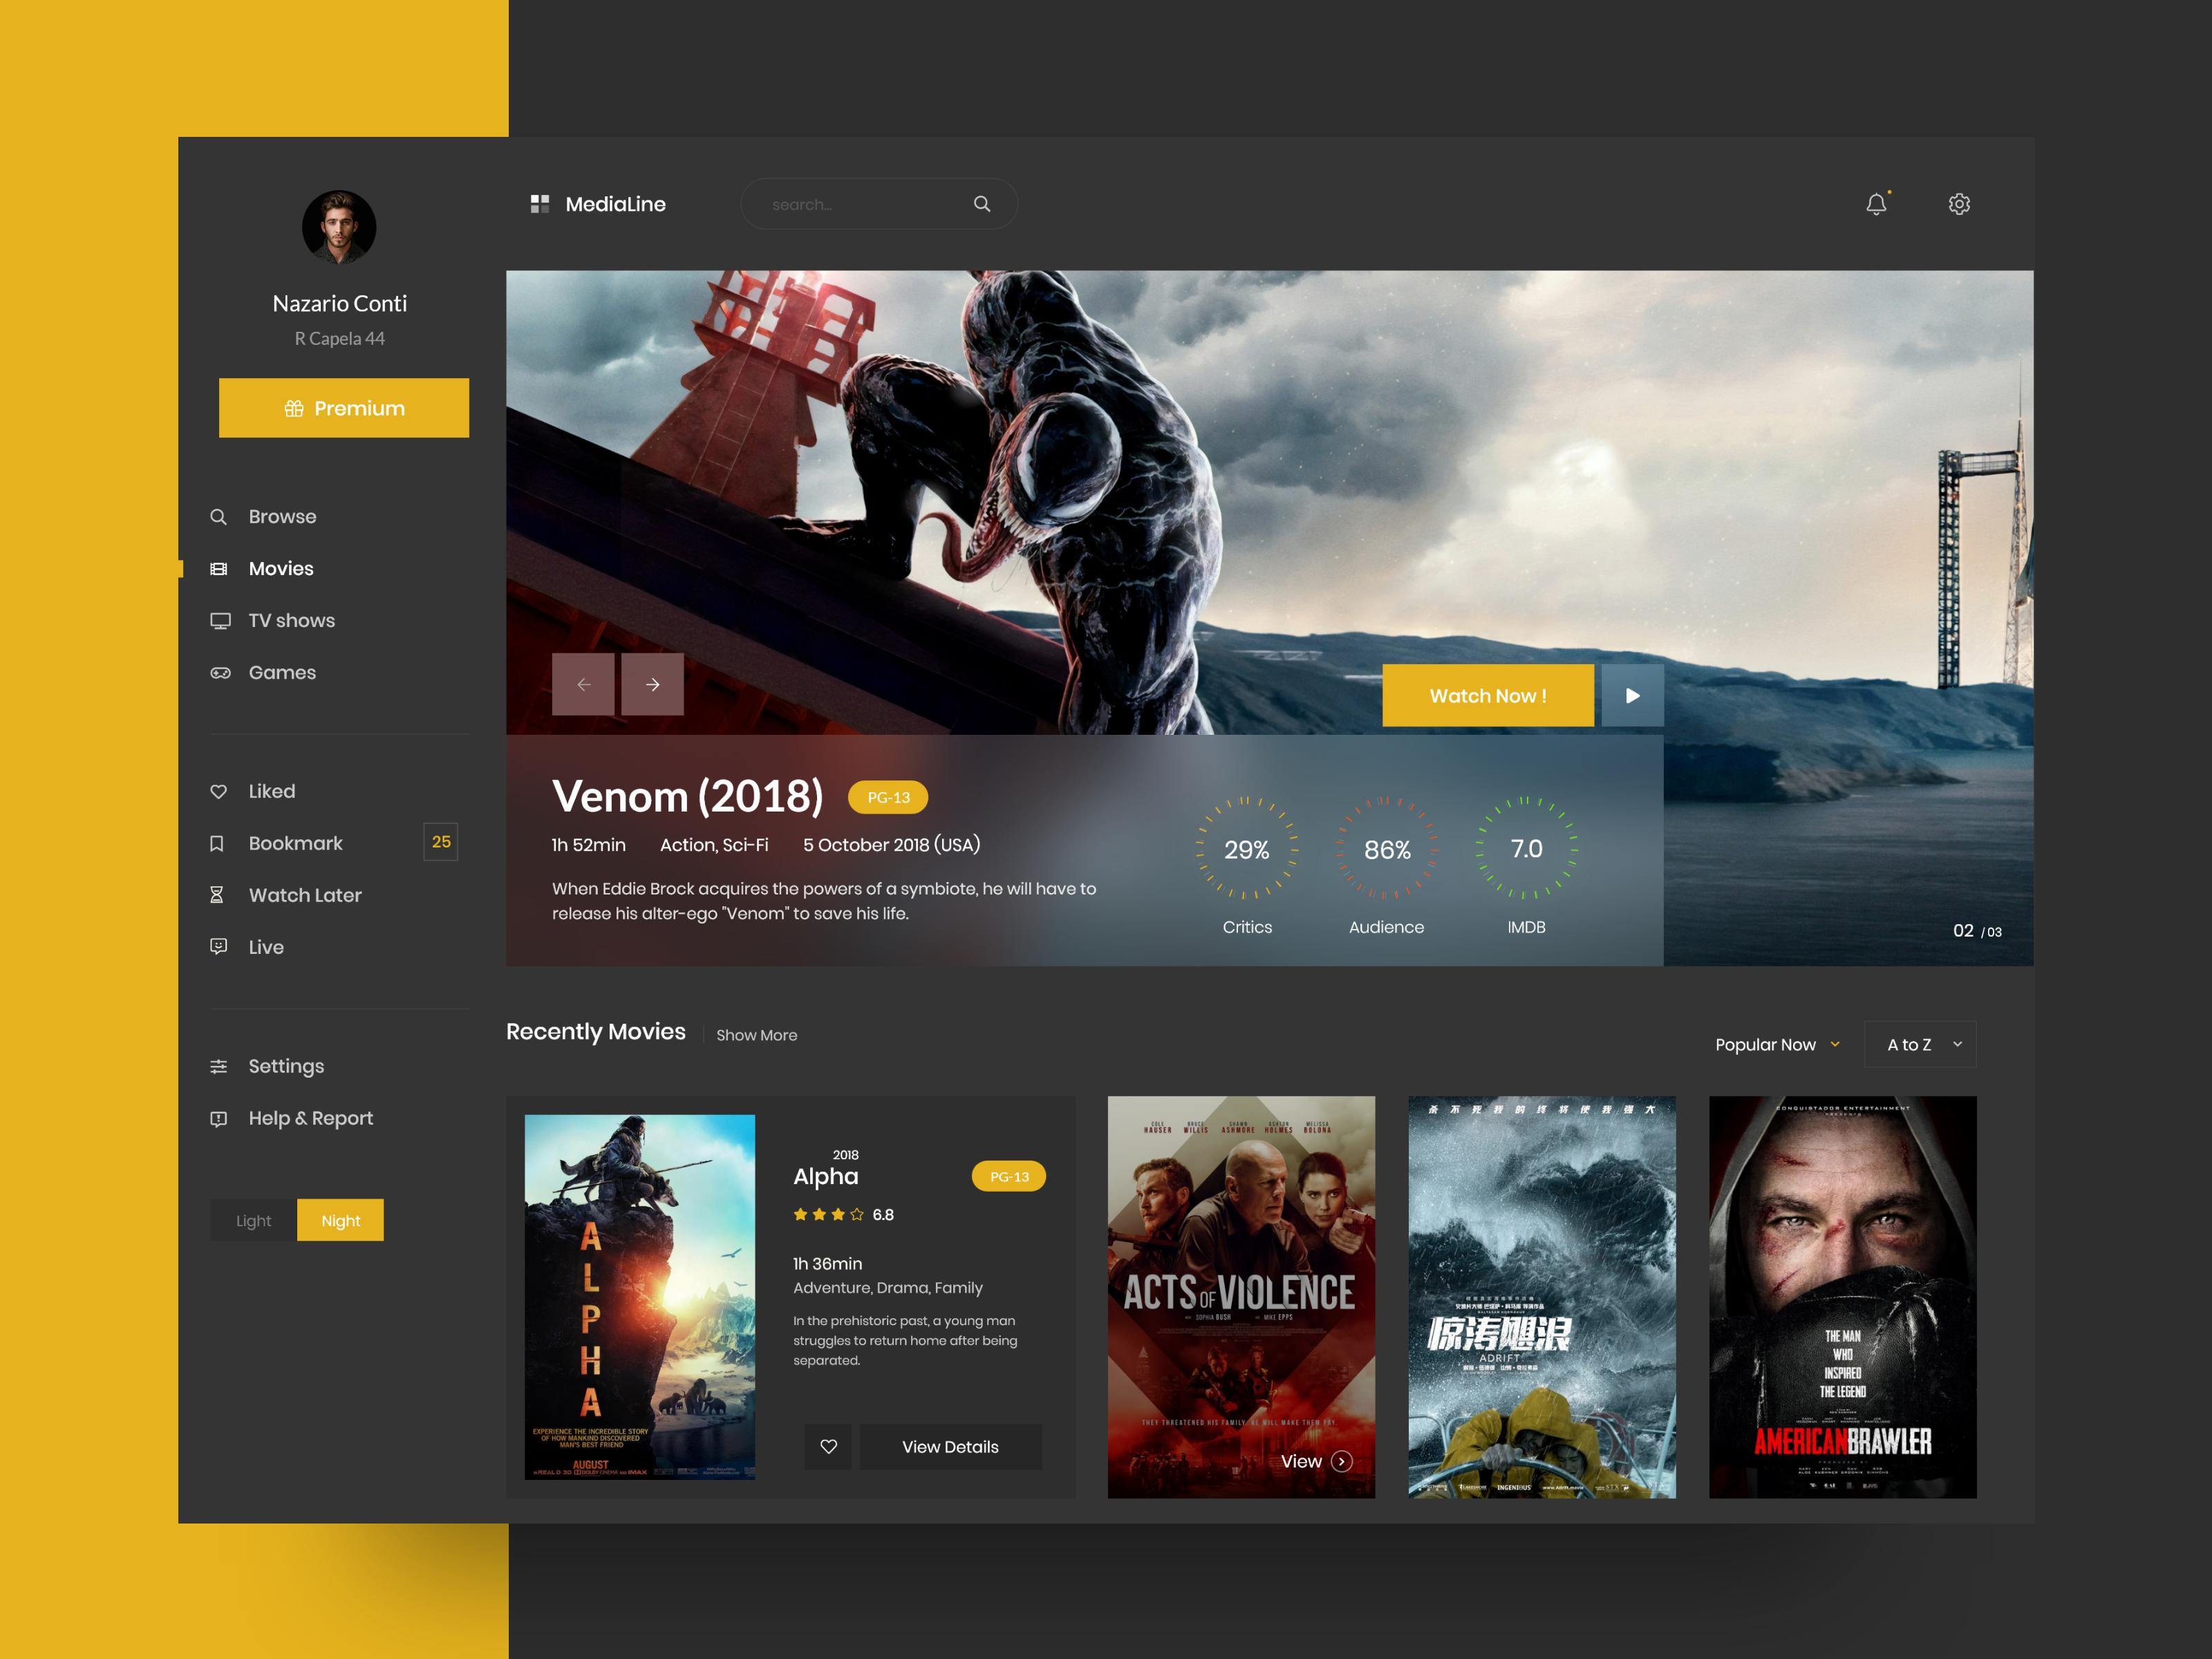 Watch Movie Website Design Web Design Examples Design